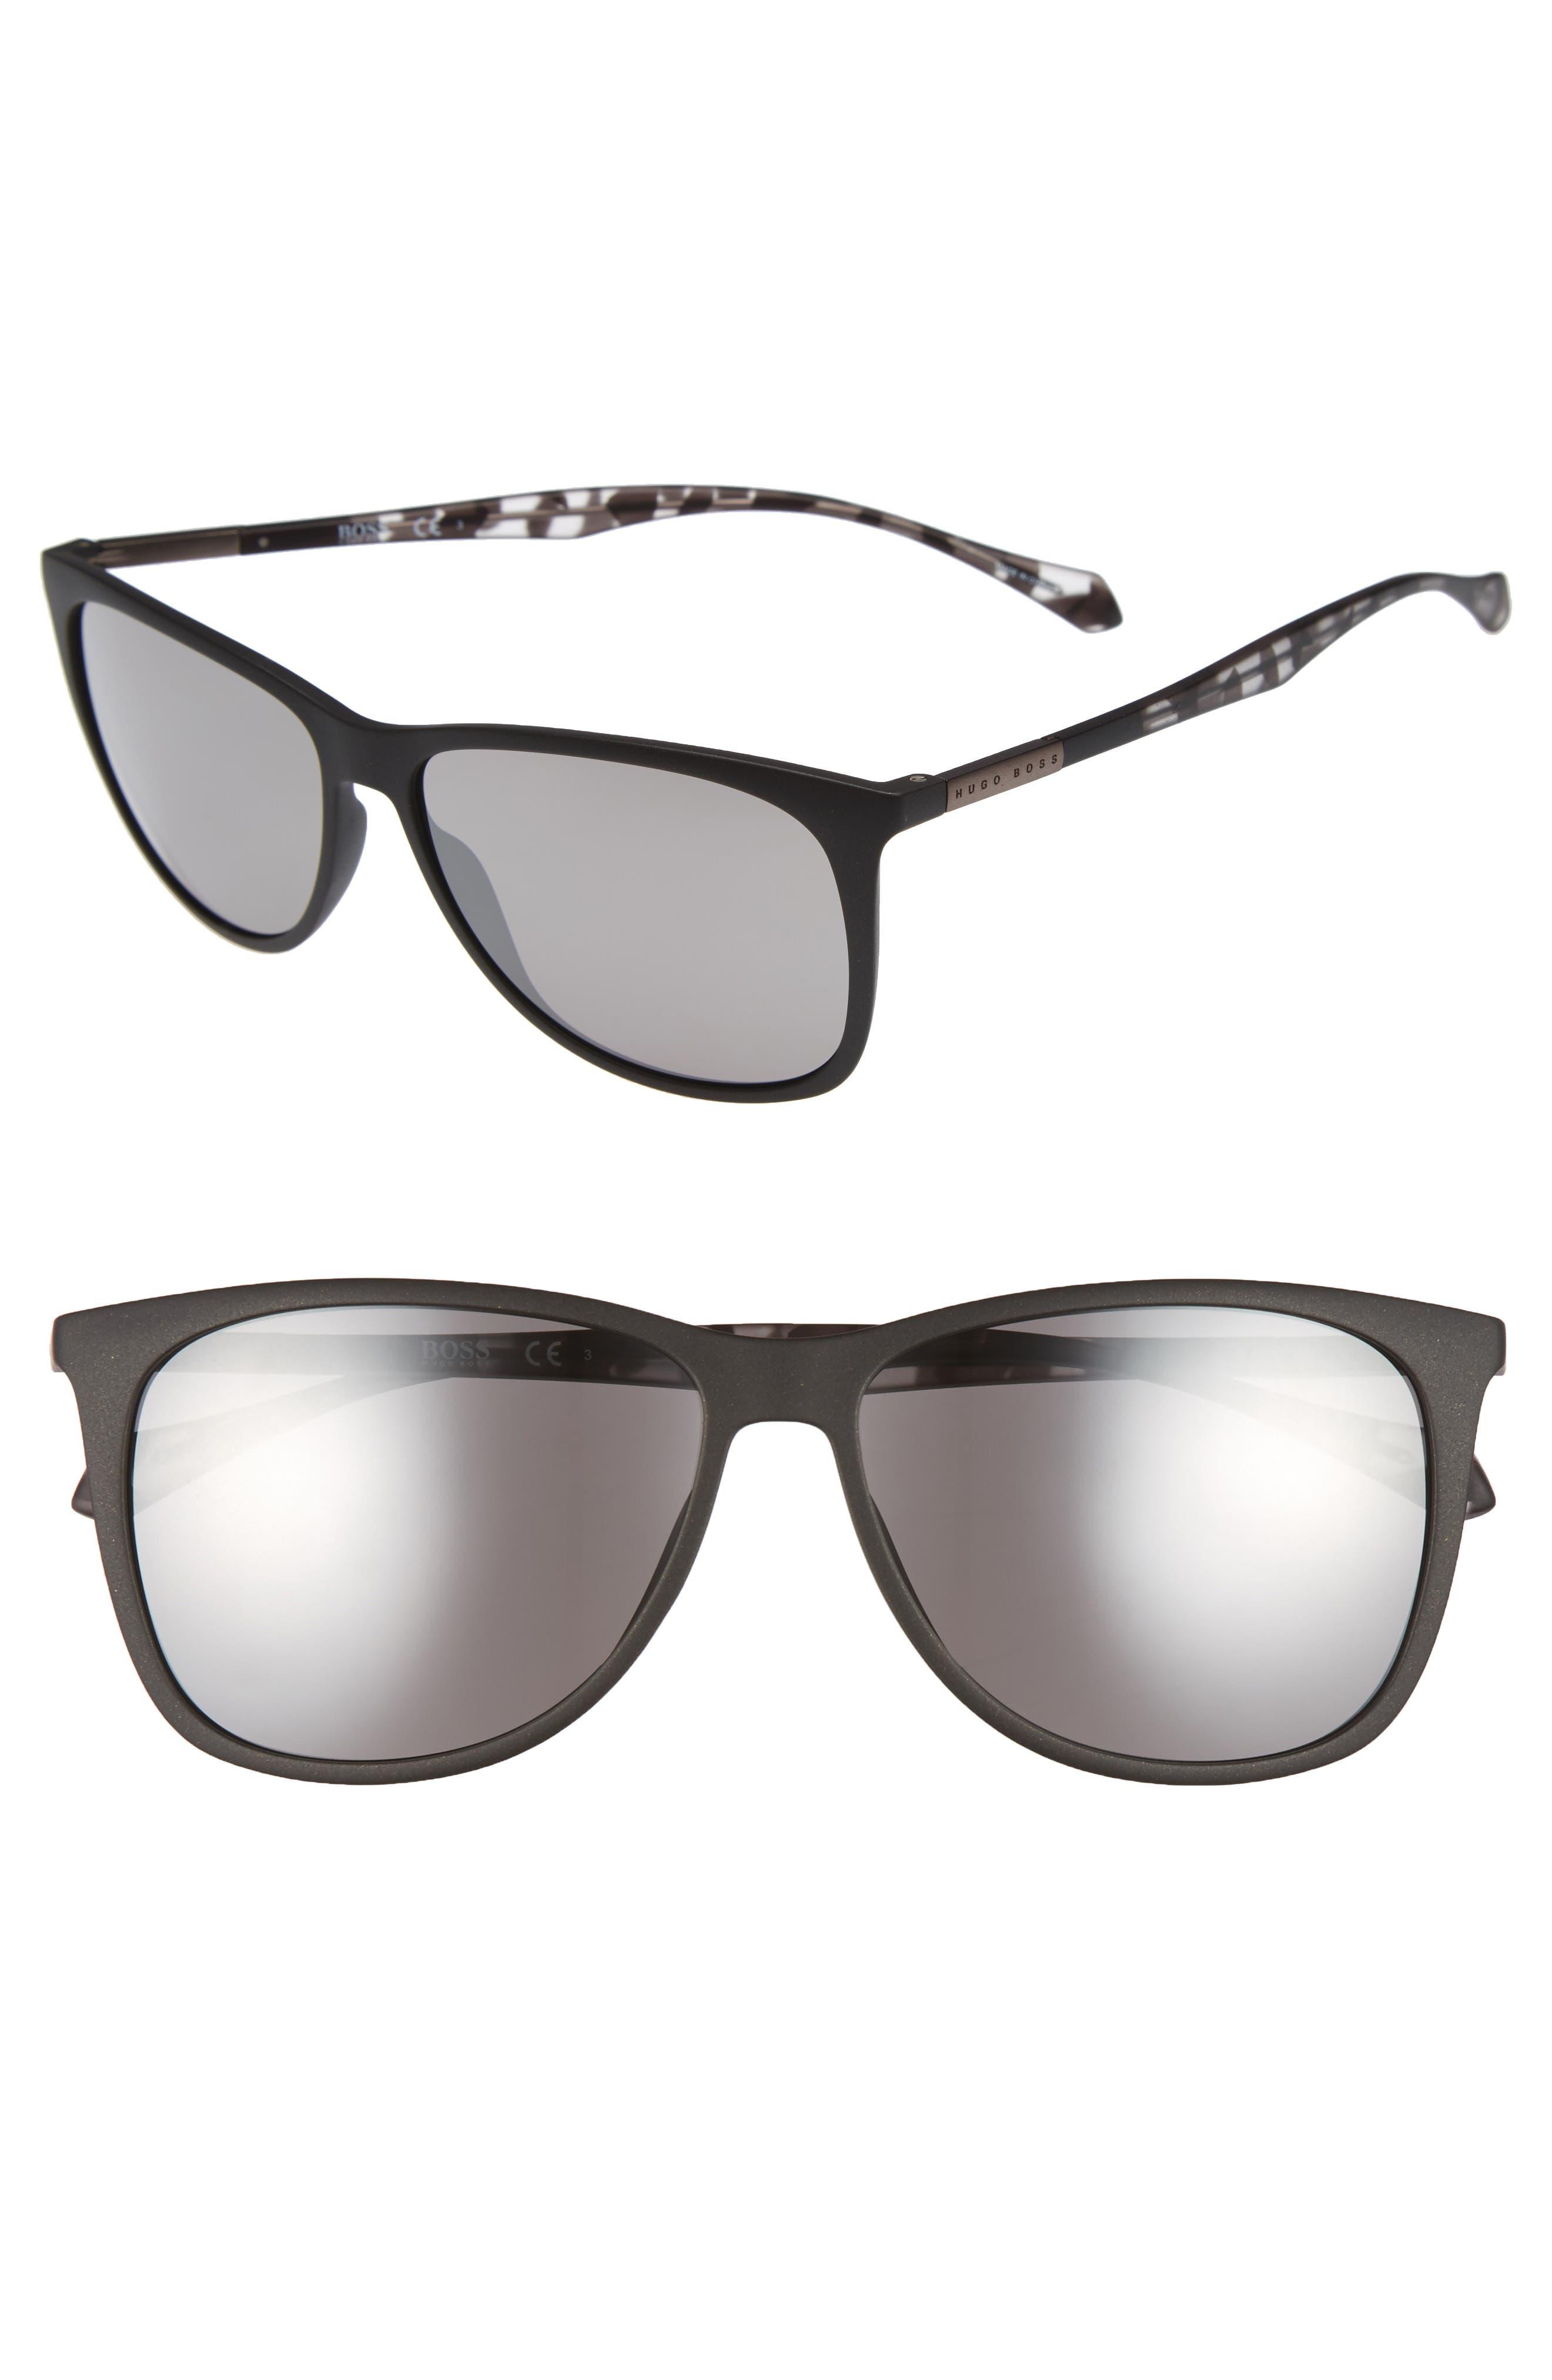 Alternate Image 1 Selected - BOSS 58mm Sunglasses